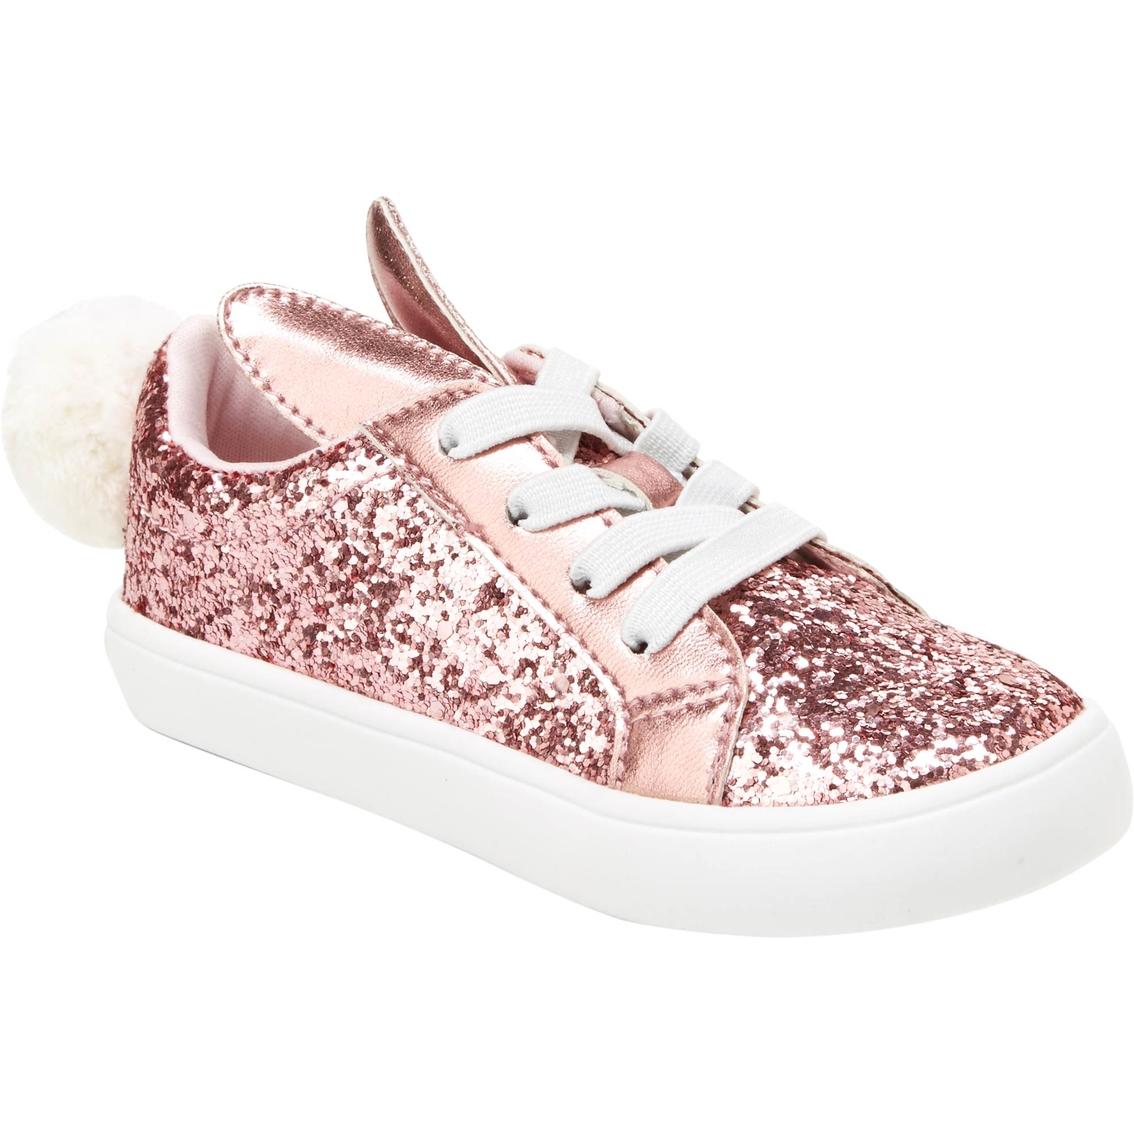 Carter's Toddler Girls Bunny Sneakers